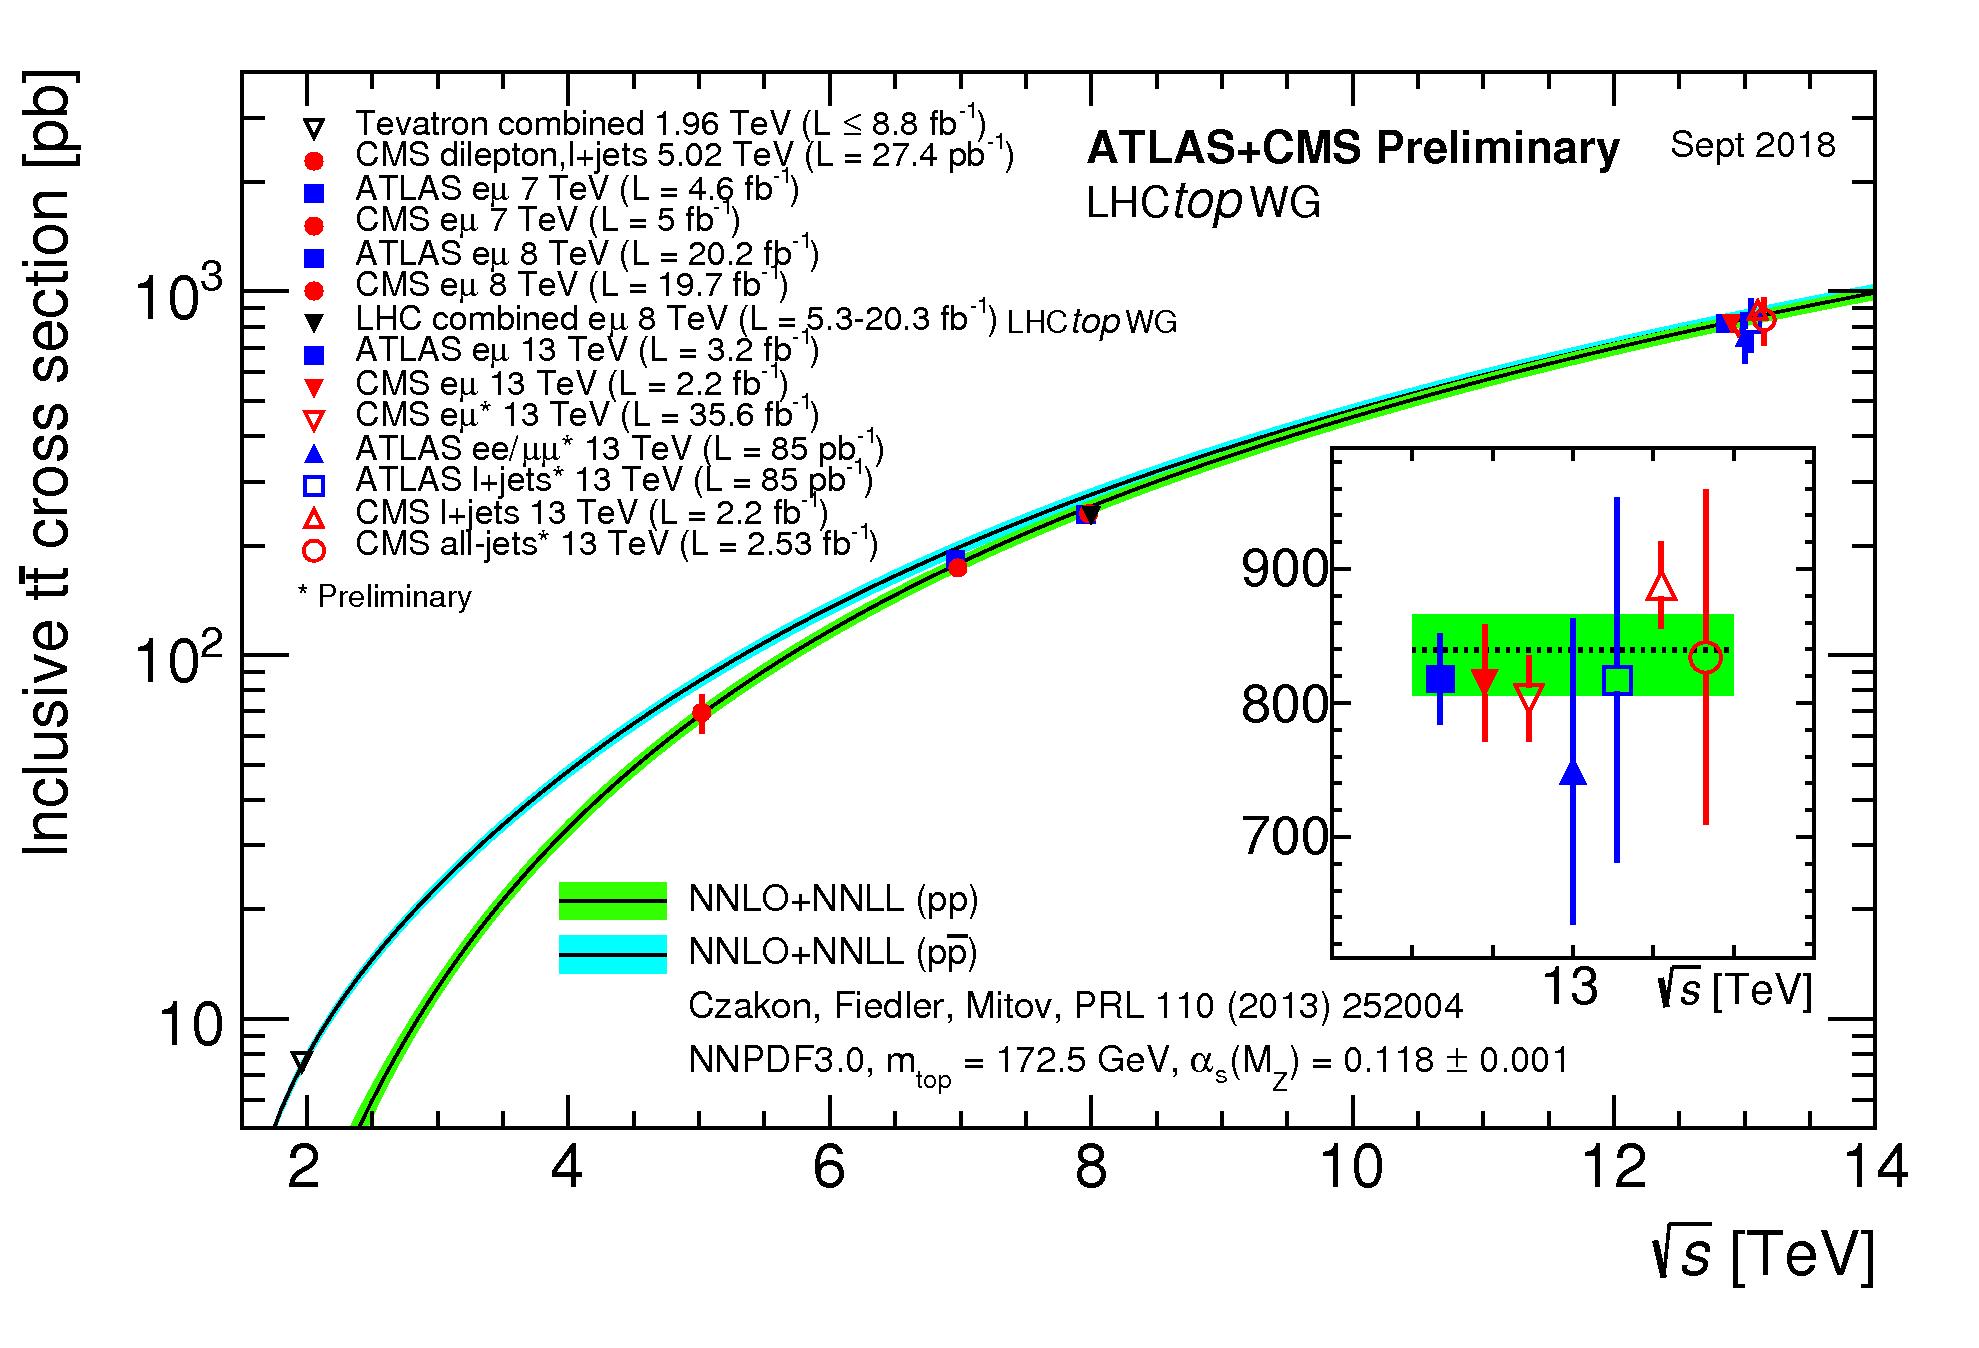 https://atlas.web.cern.ch/Atlas/GROUPS/PHYSICS/CombinedSummaryPlots/TOP/tt_xsec_vsroots/tt_xsec_vsroots.png